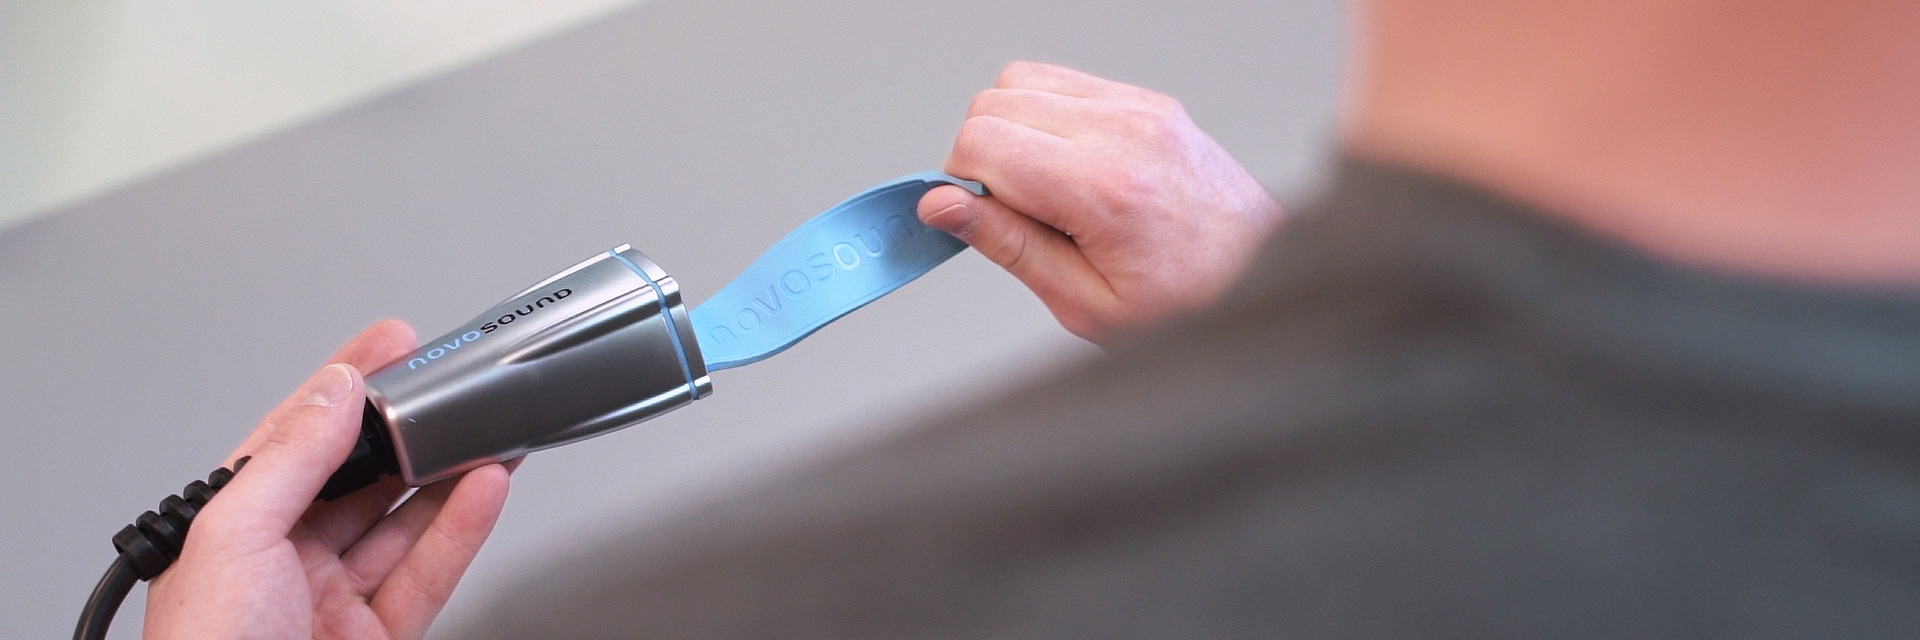 Novosound - Flexible Inspection Array inspection